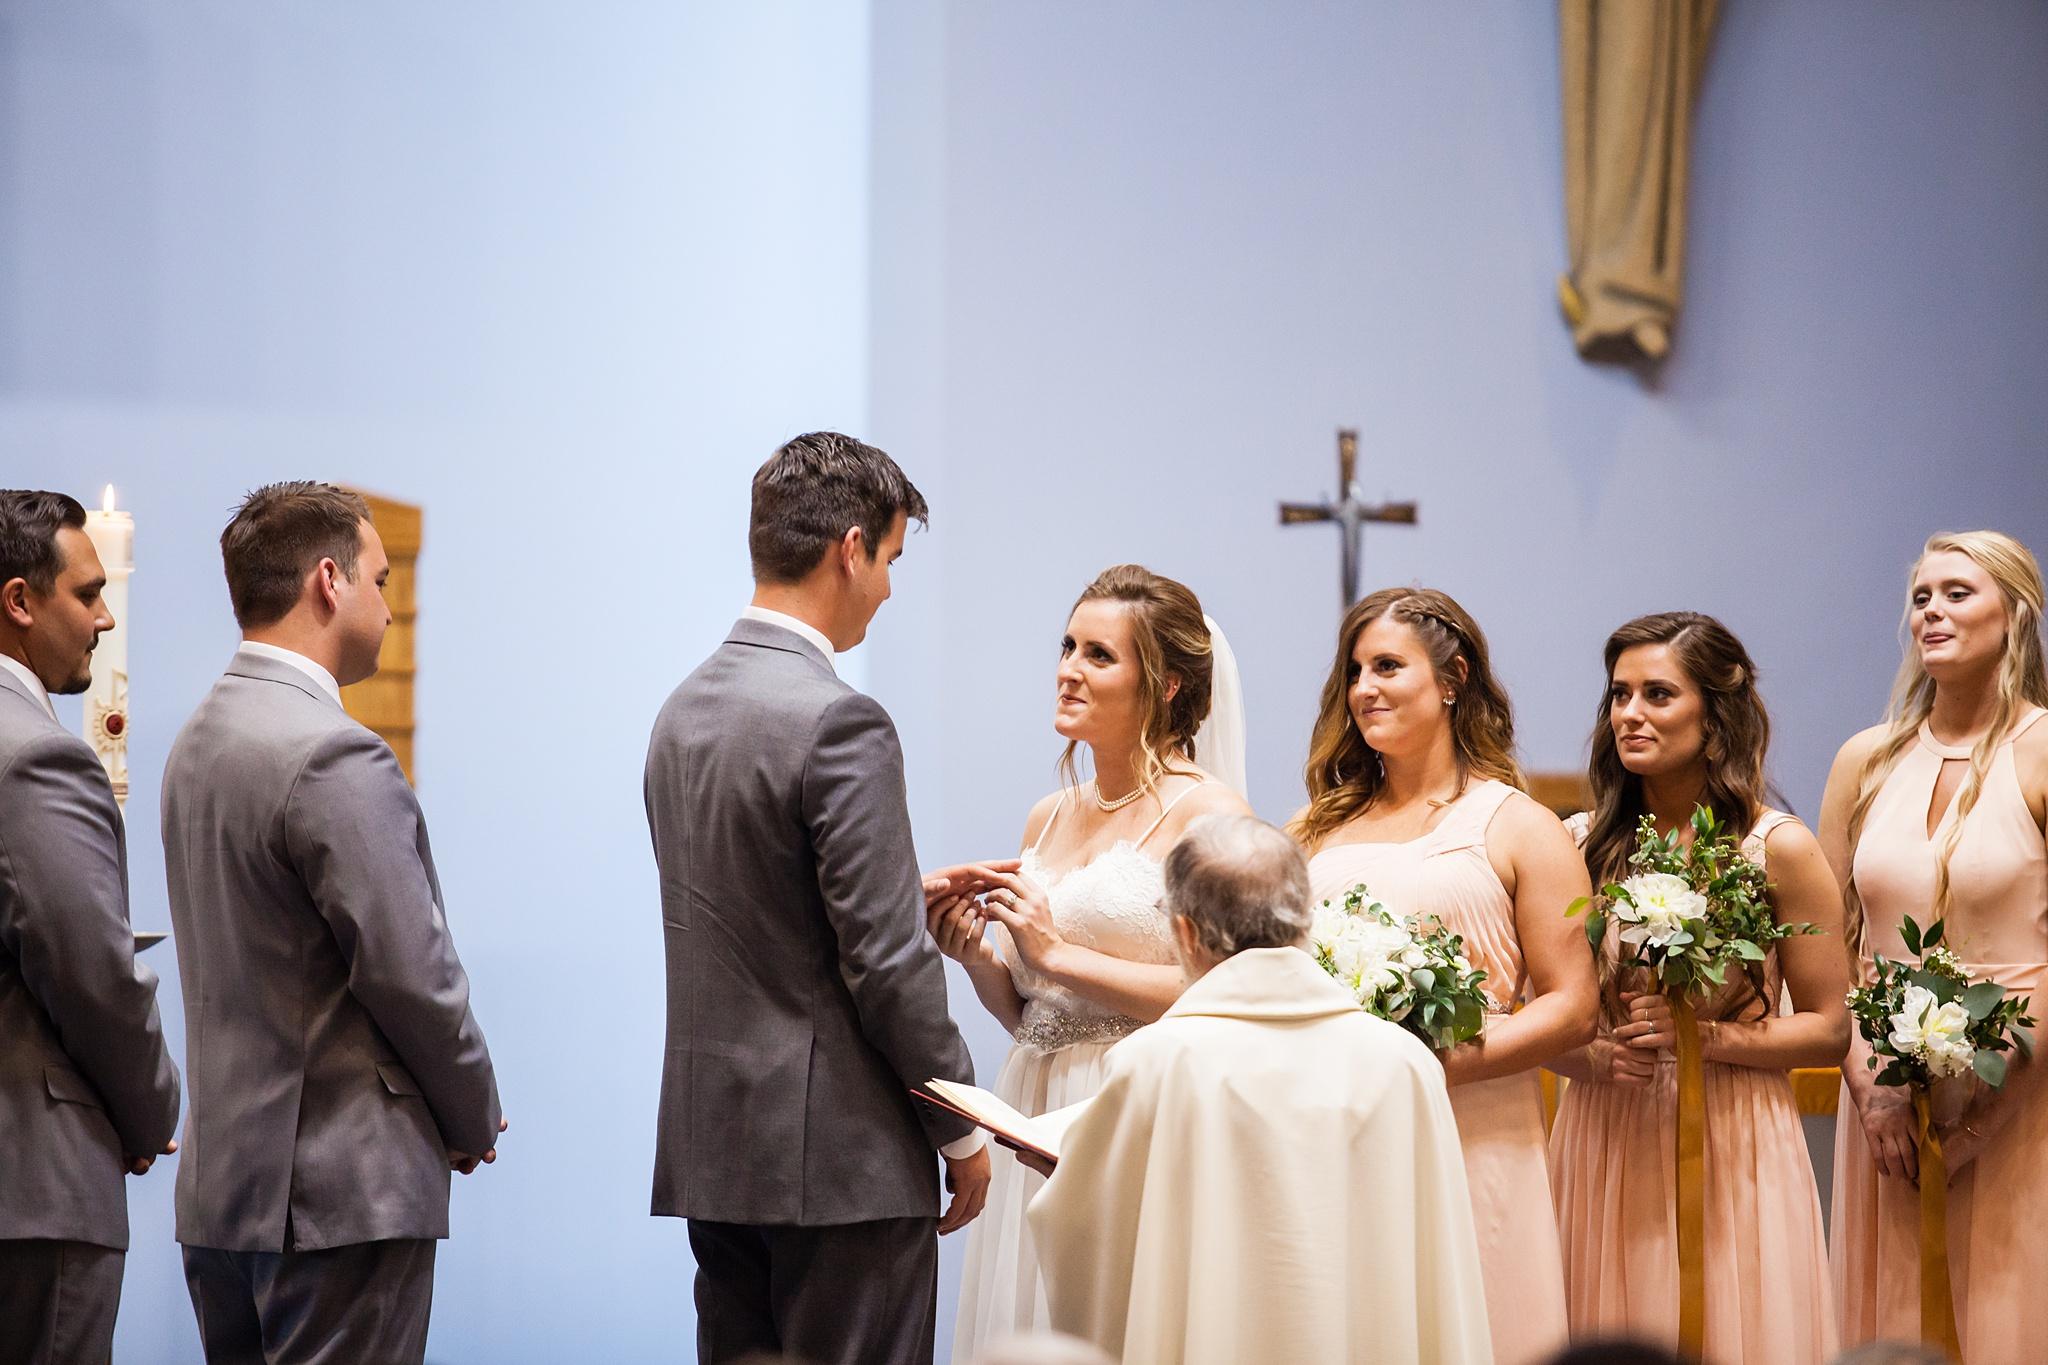 Meghan_Drew_Grand_Rapids_Cheney_place_Wedding053.JPG